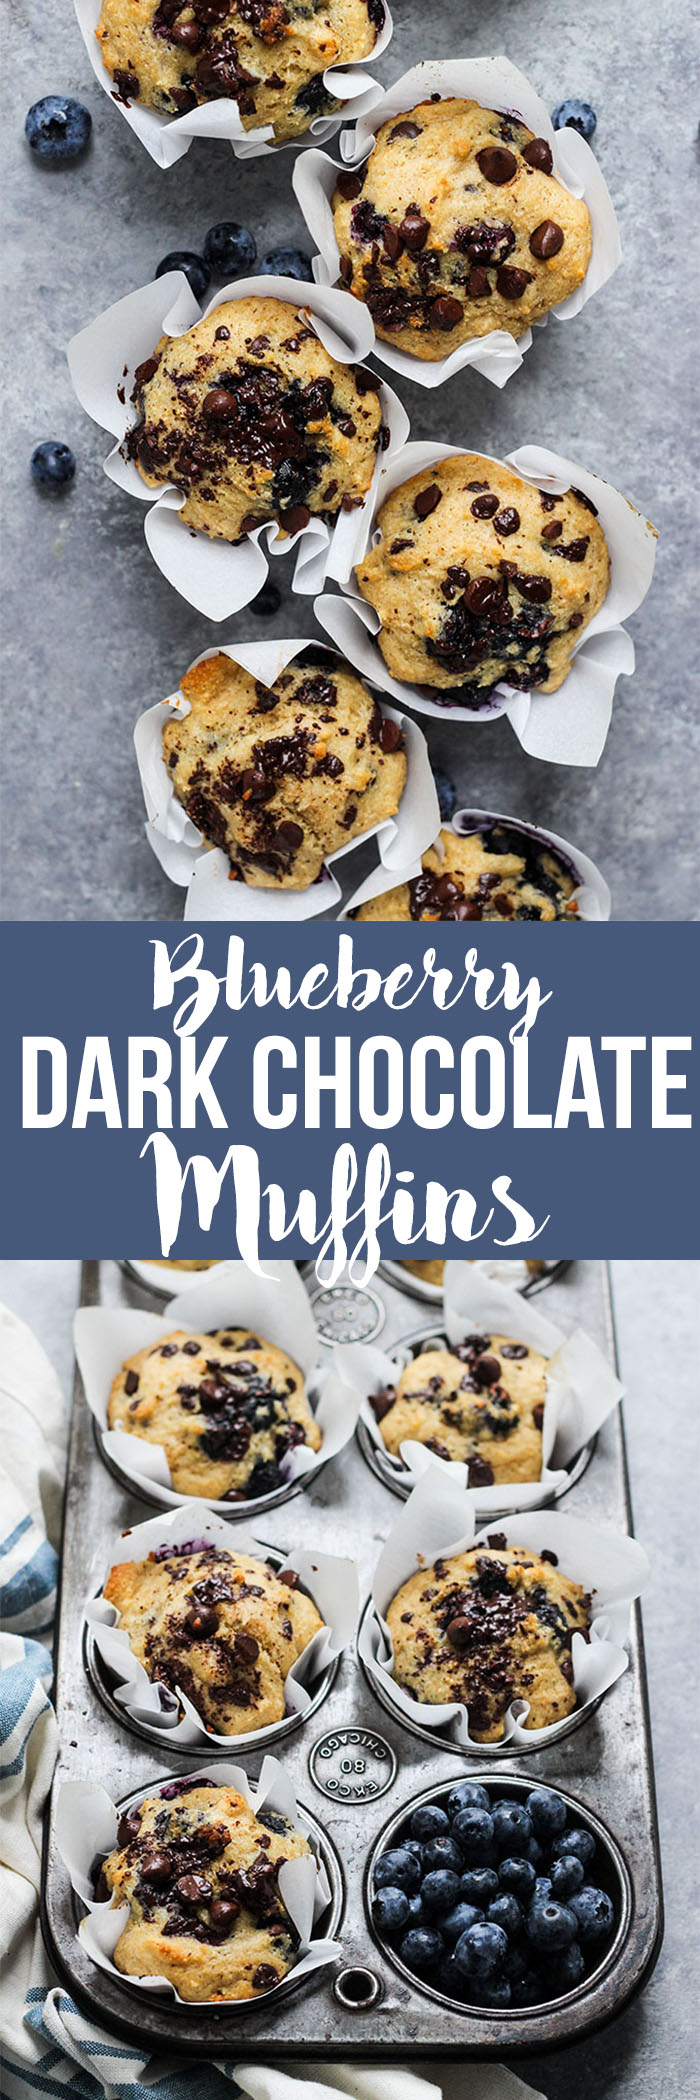 blueberry dark chocolate muffins on gray background